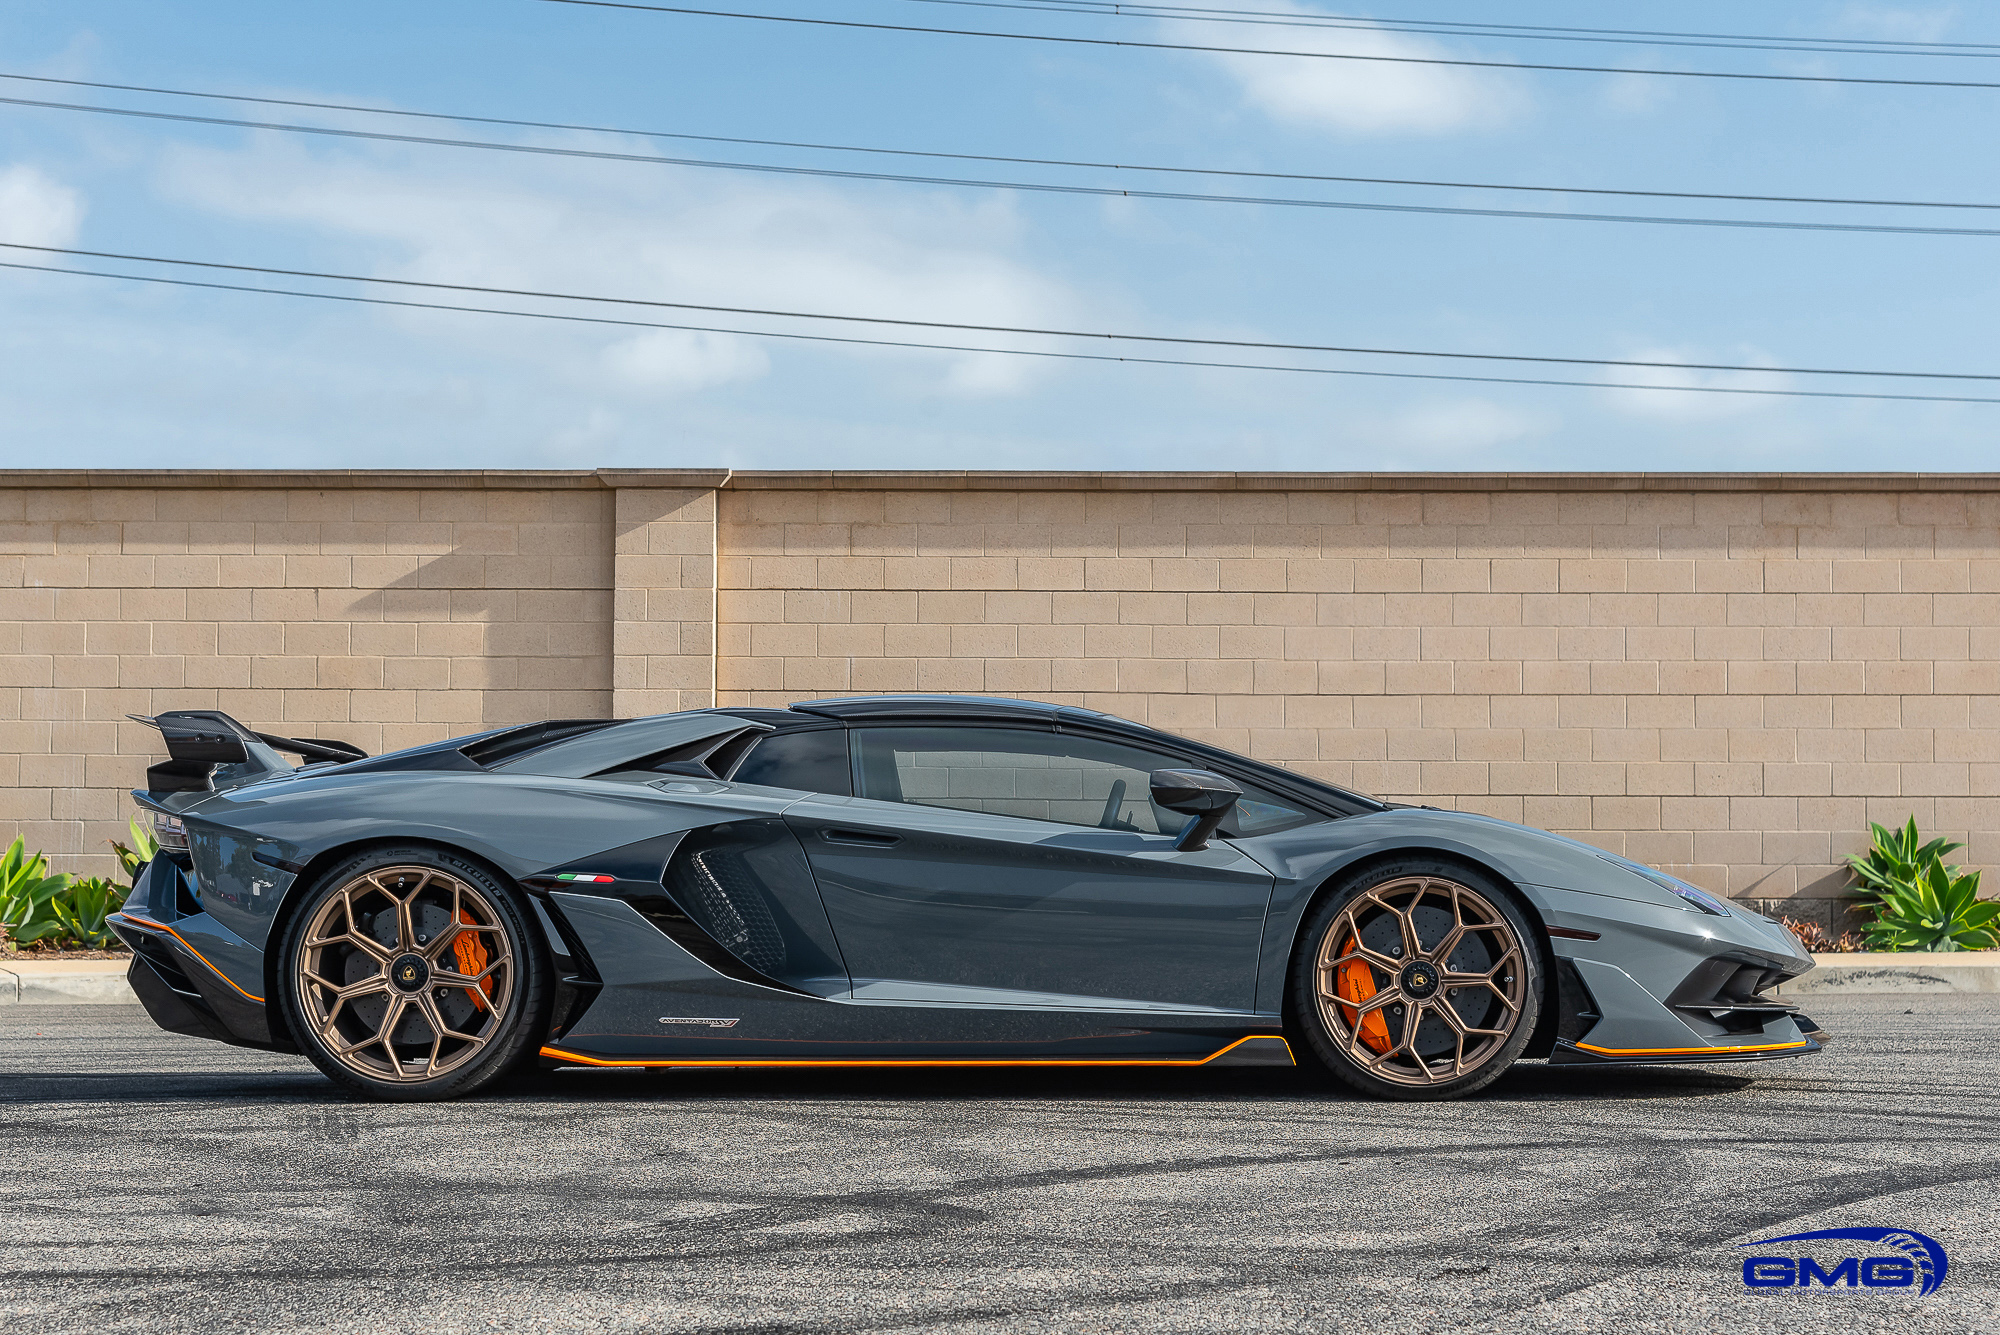 Grigio Telesto Lamborghini Aventador SVJ